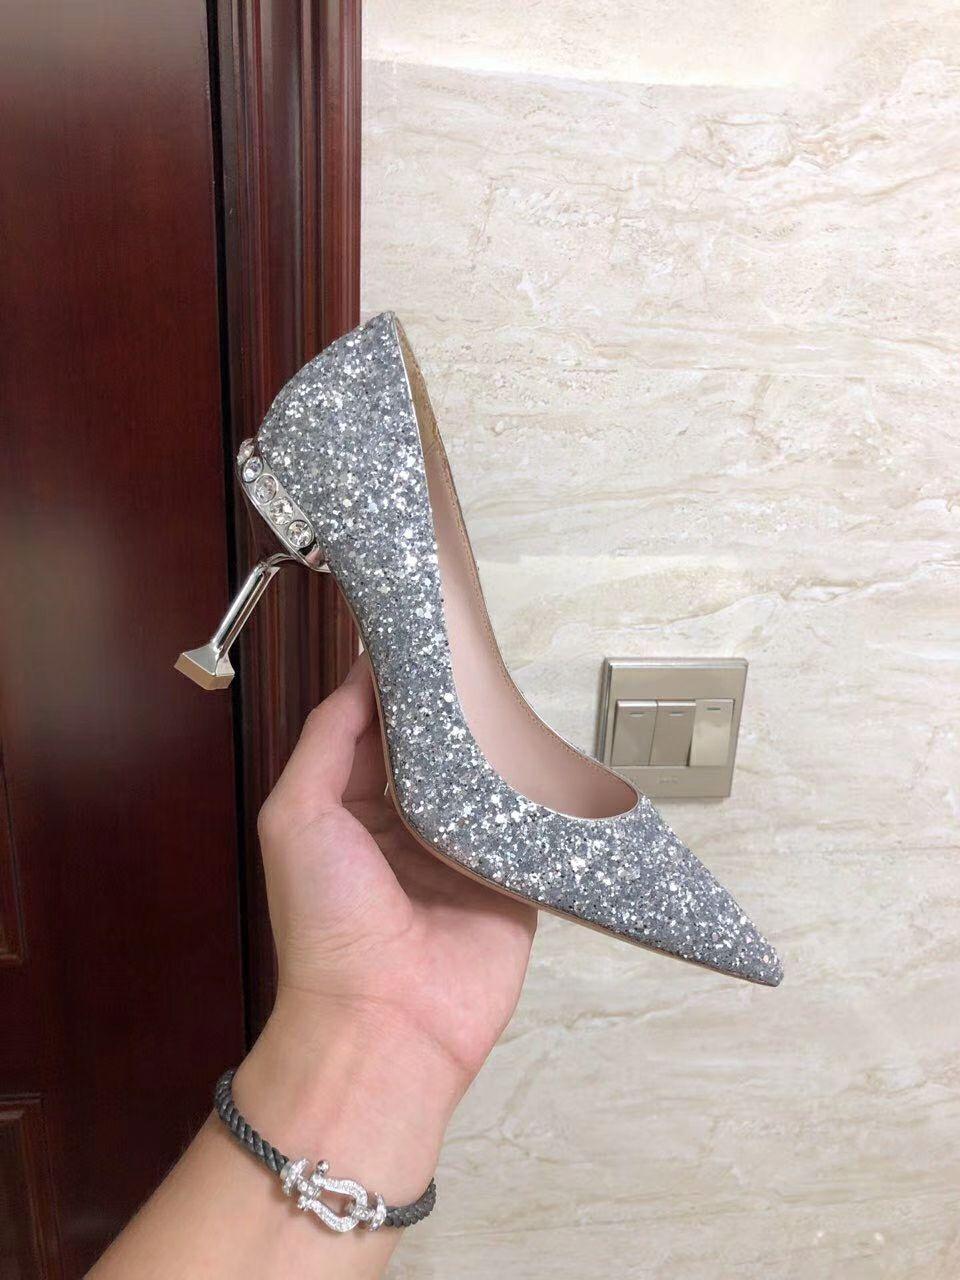 MIU MIU GLITTER FABRIC PUMPS 85 mm heel with crystals SI  ER  1